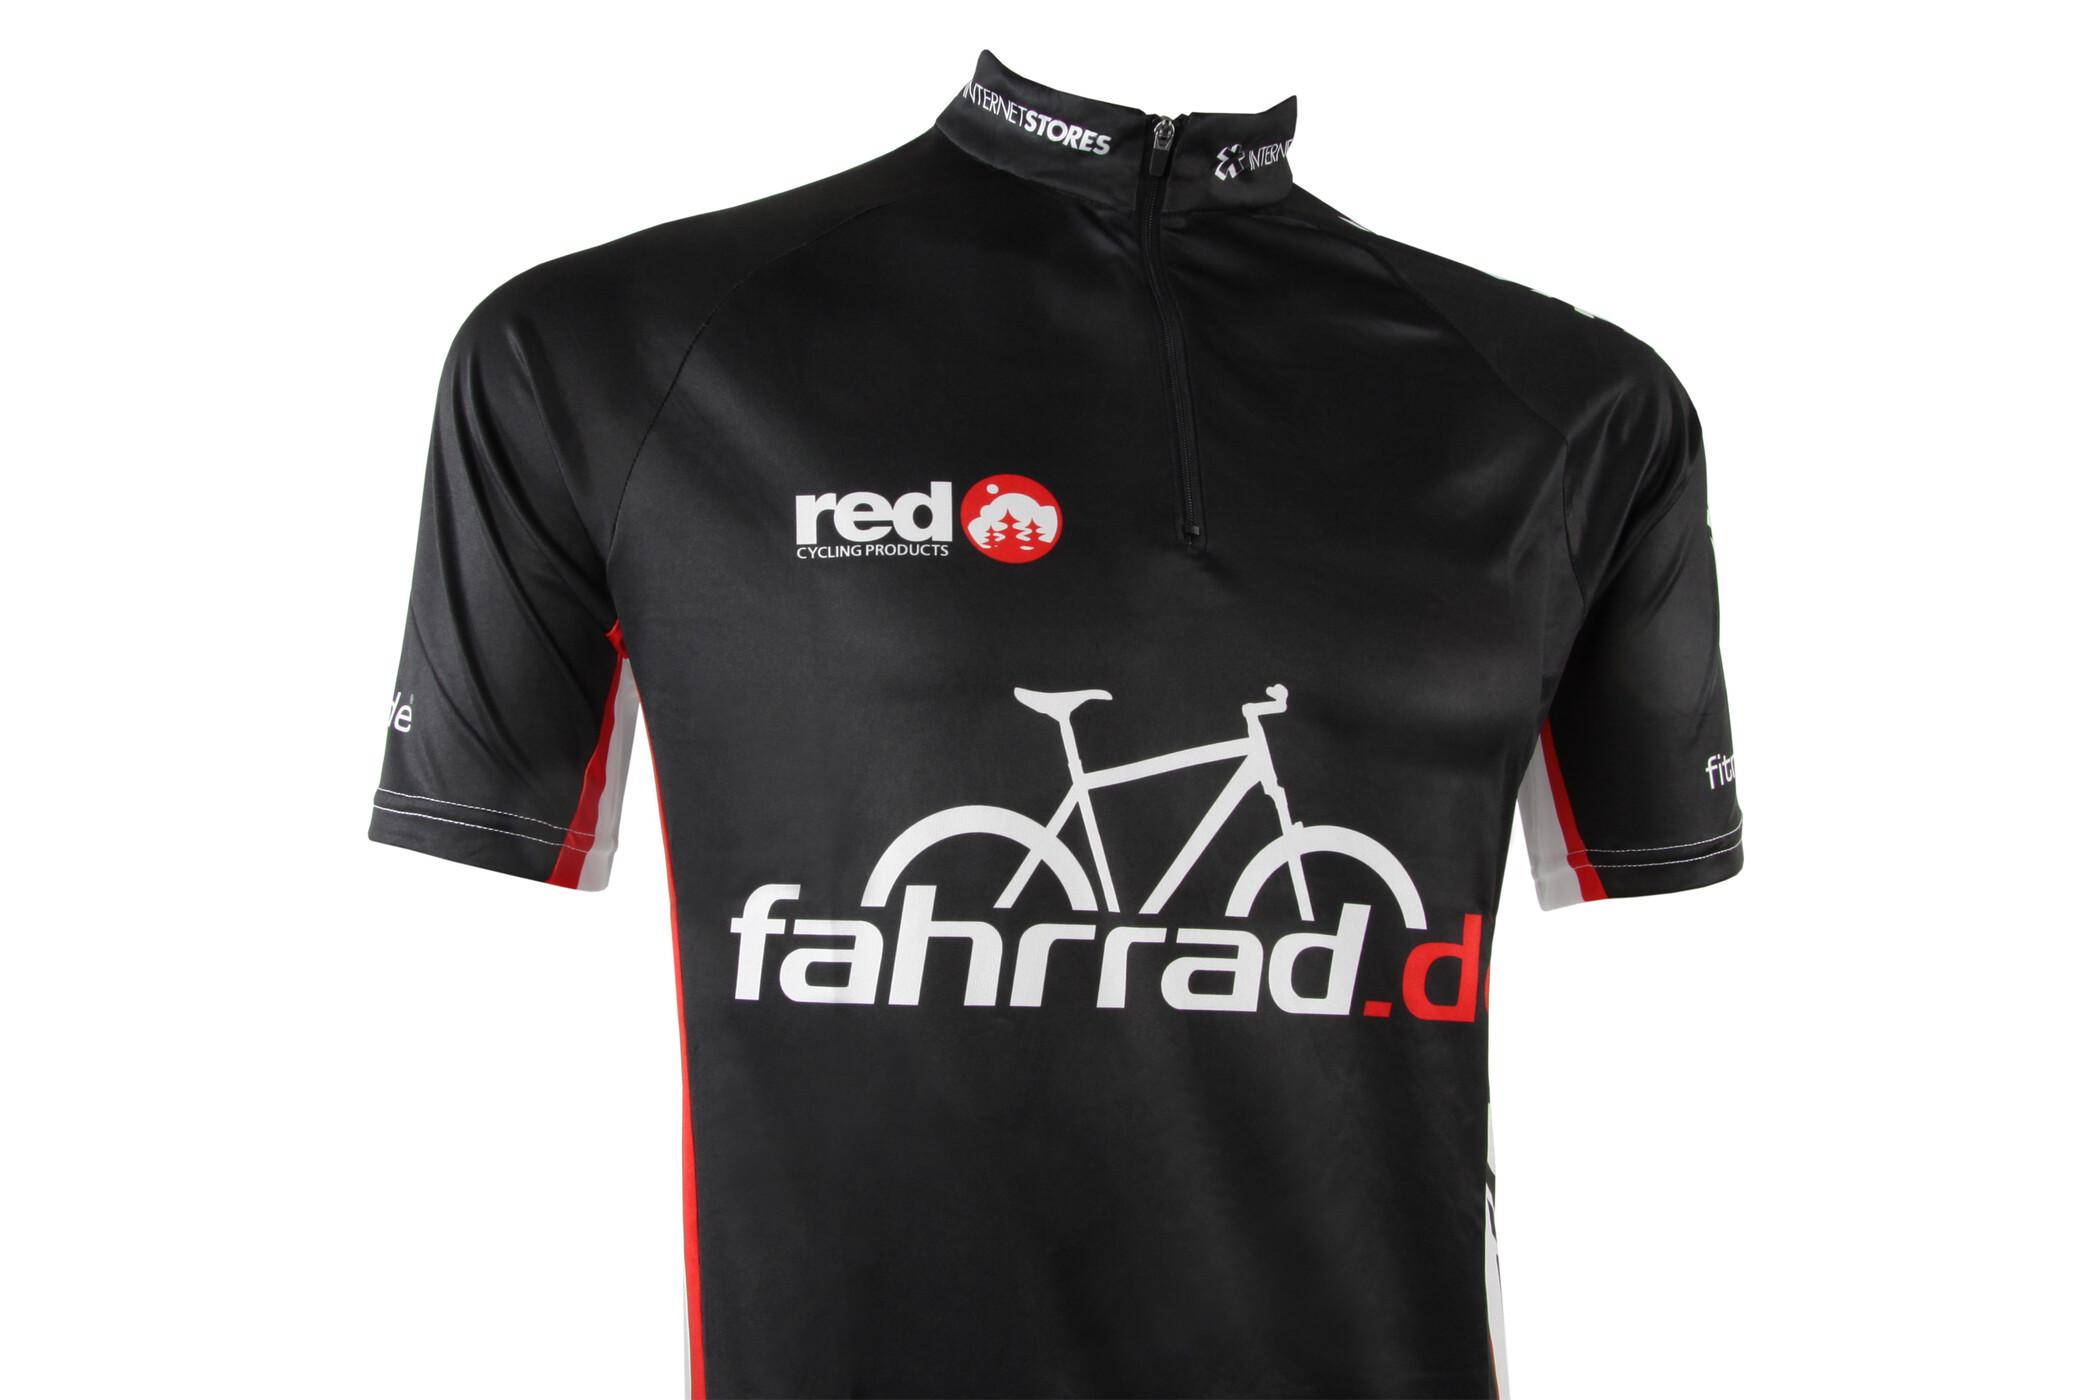 10_Medico_fahrrad_de_basic_team_jersey_3